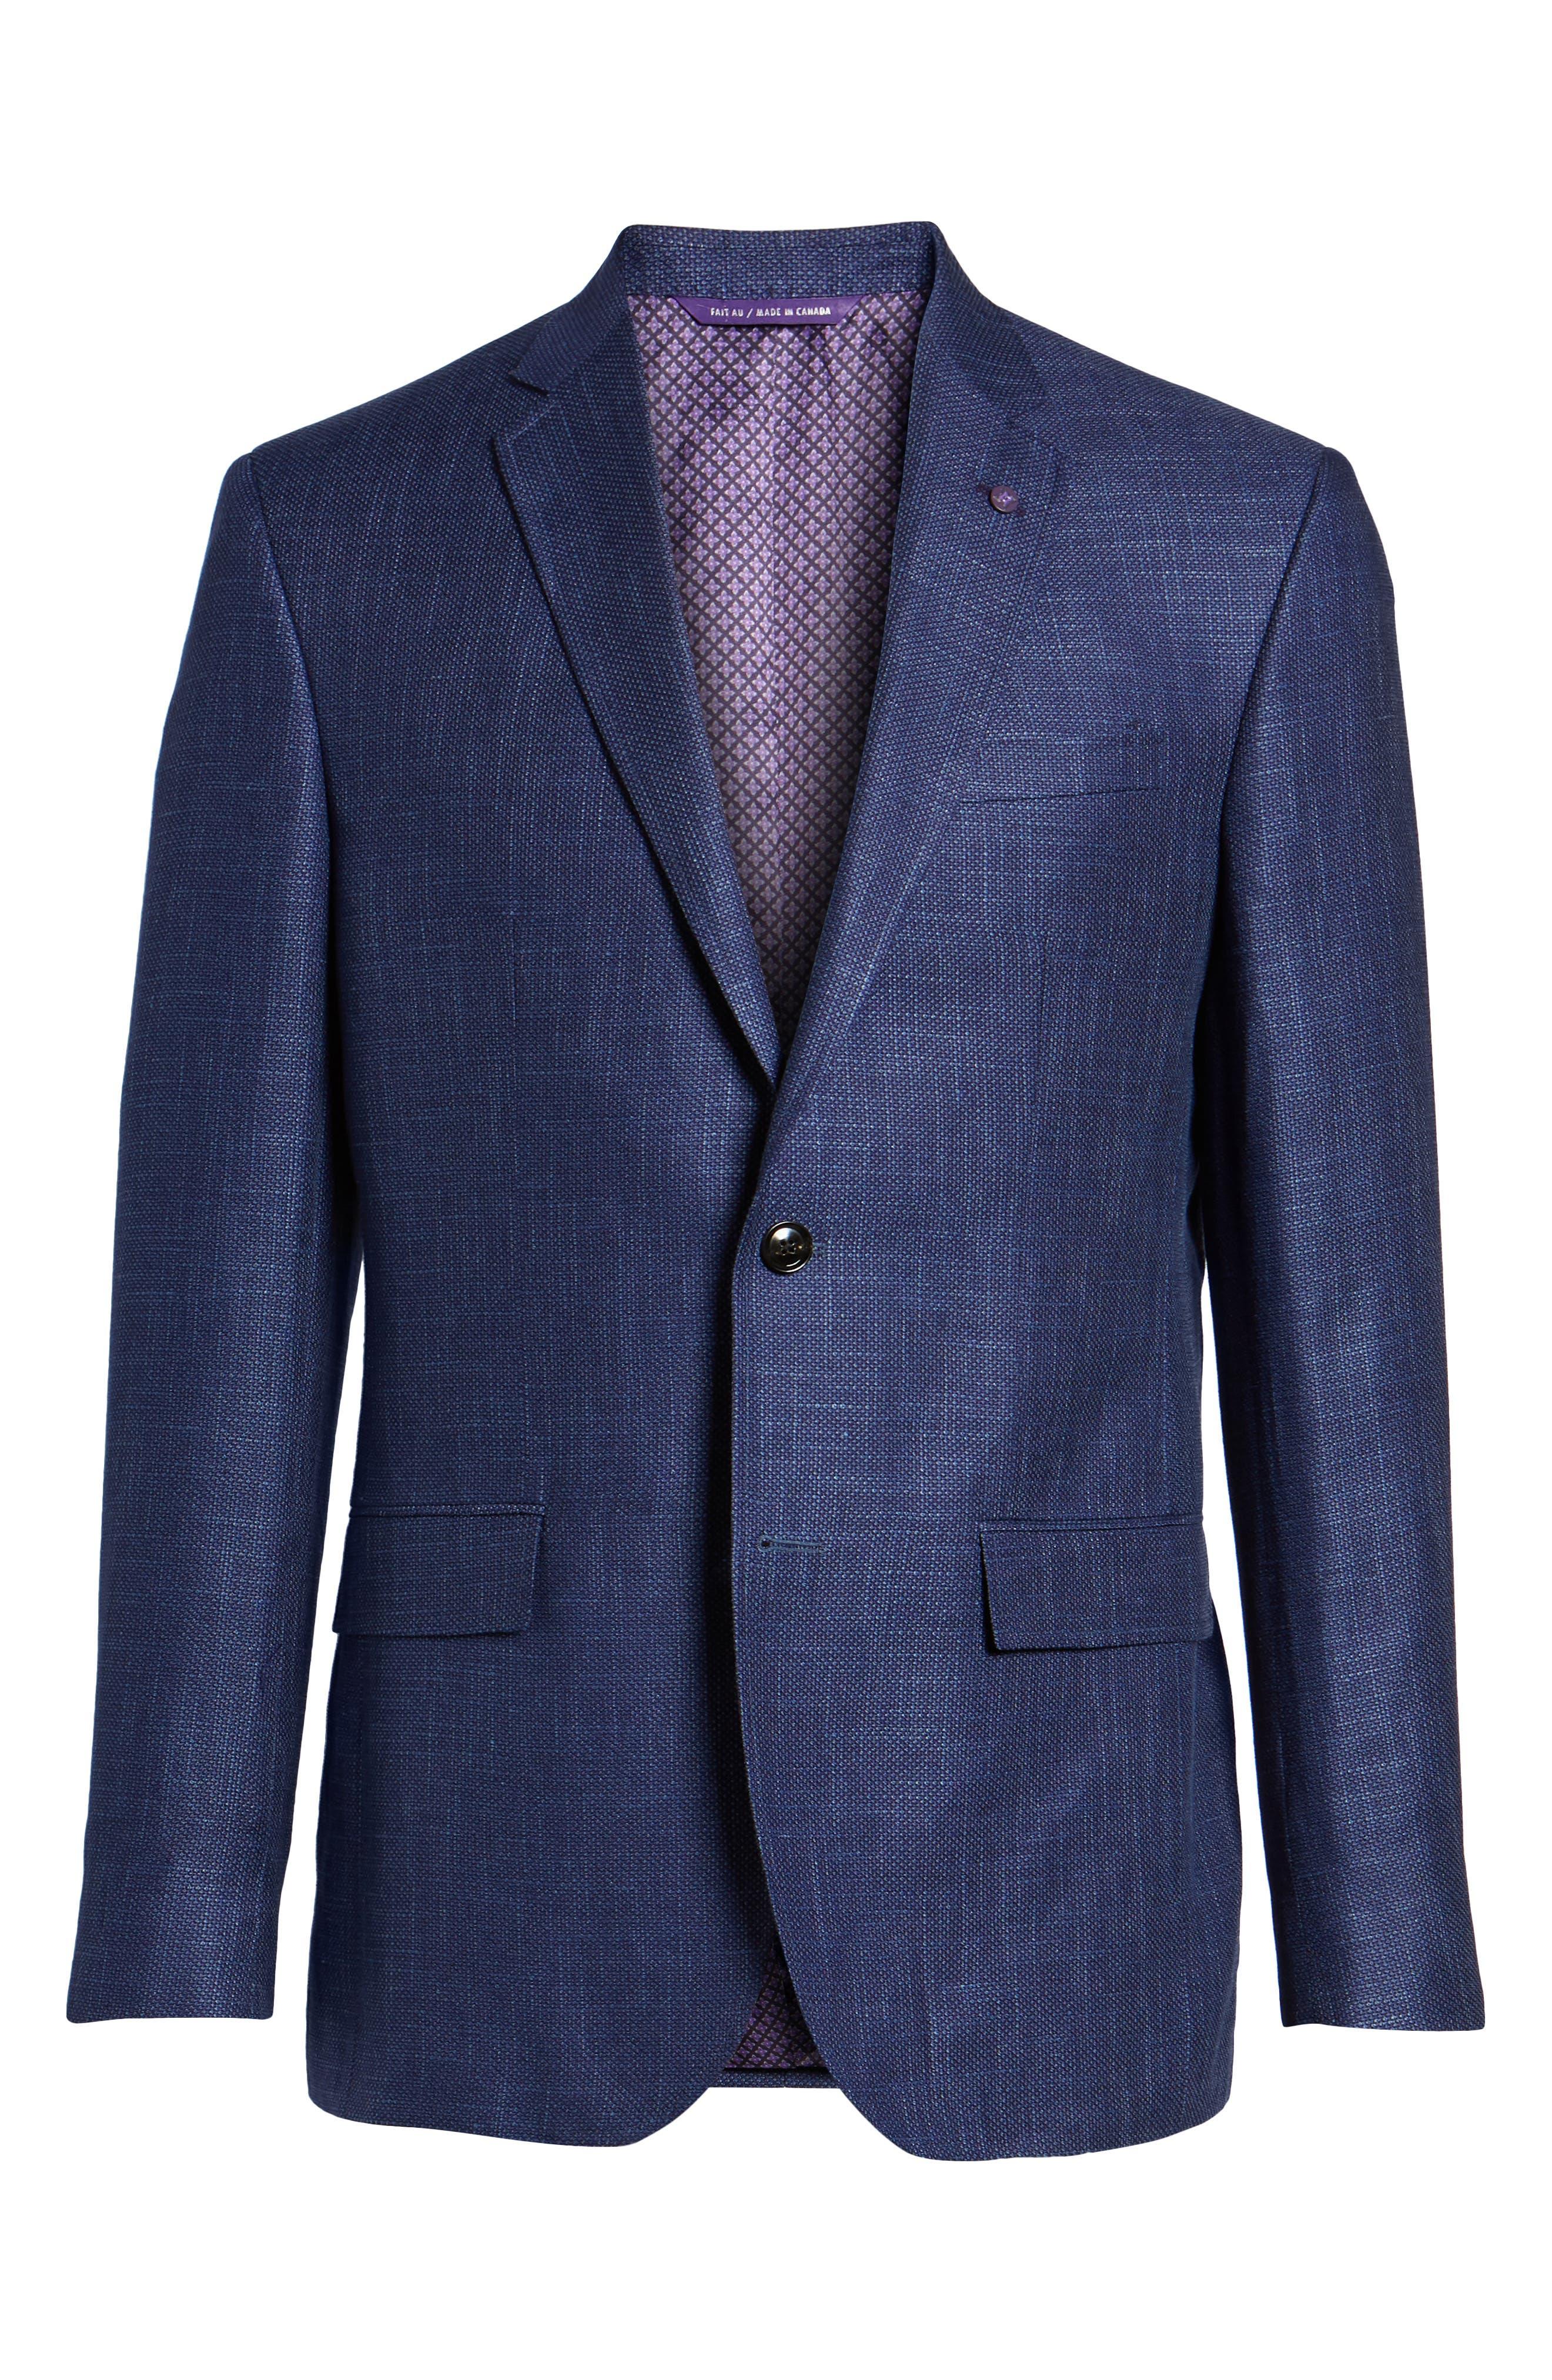 Jay Trim Fit Linen & Wool Blazer,                             Alternate thumbnail 6, color,                             Blue